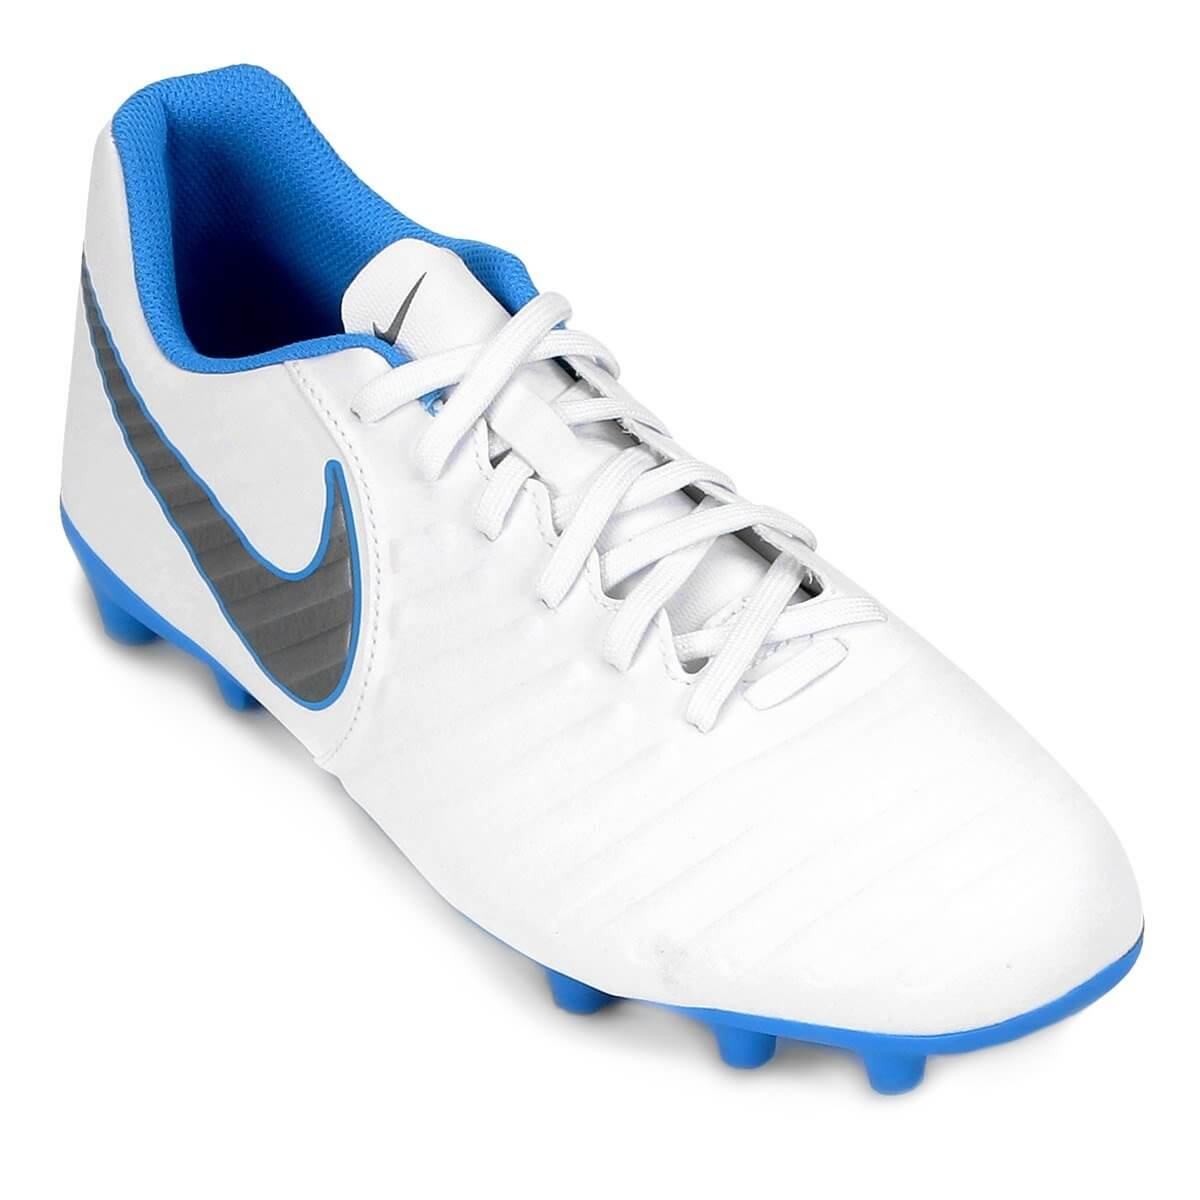 b64576aa74c10 Chuteira Nike Tiempo Legend 7 Club FG Campo Masculina - Decker!